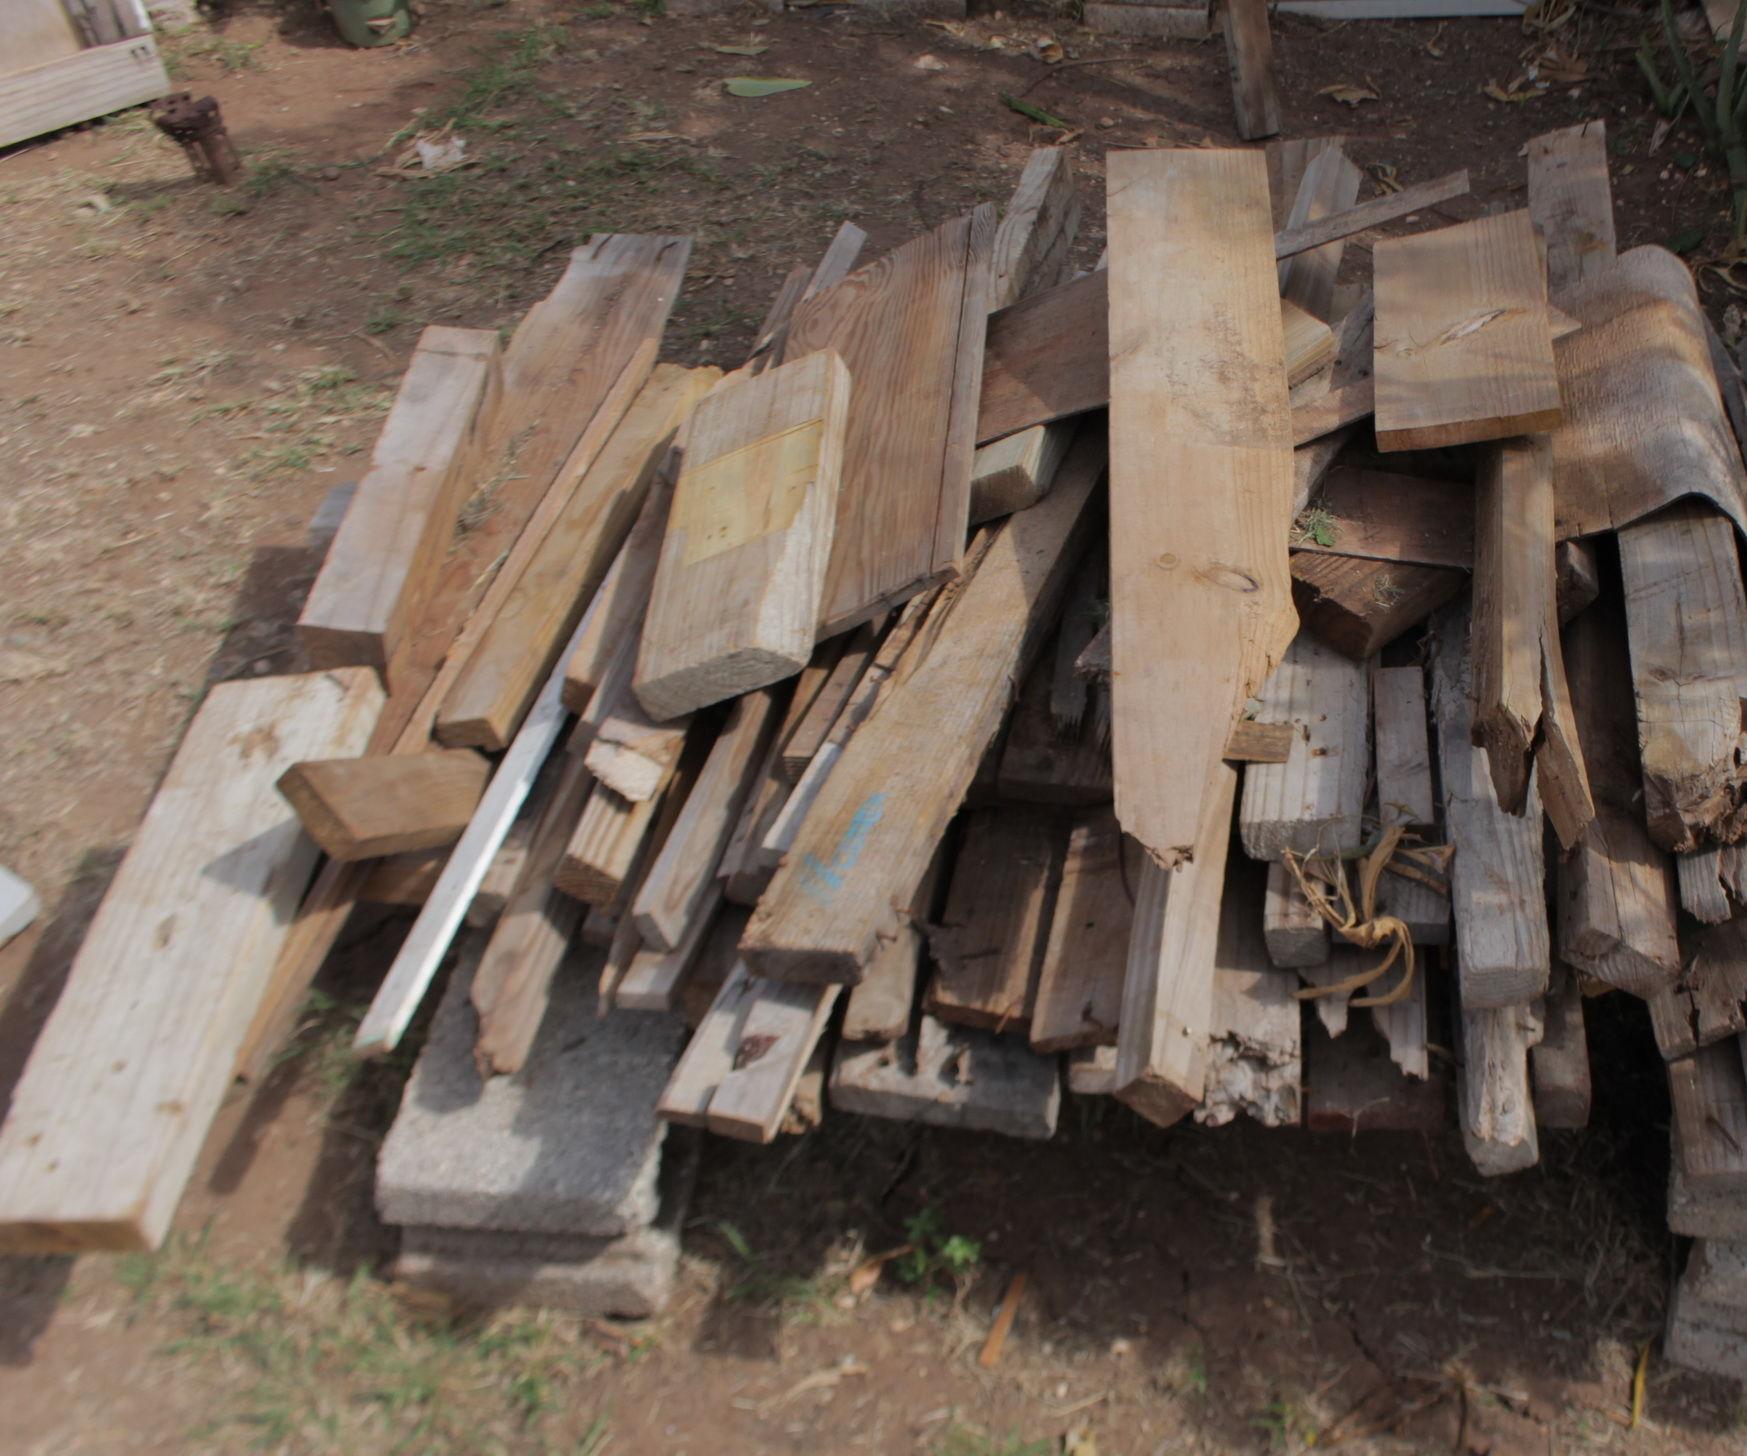 Outdoor Workbench From Scrap Wood